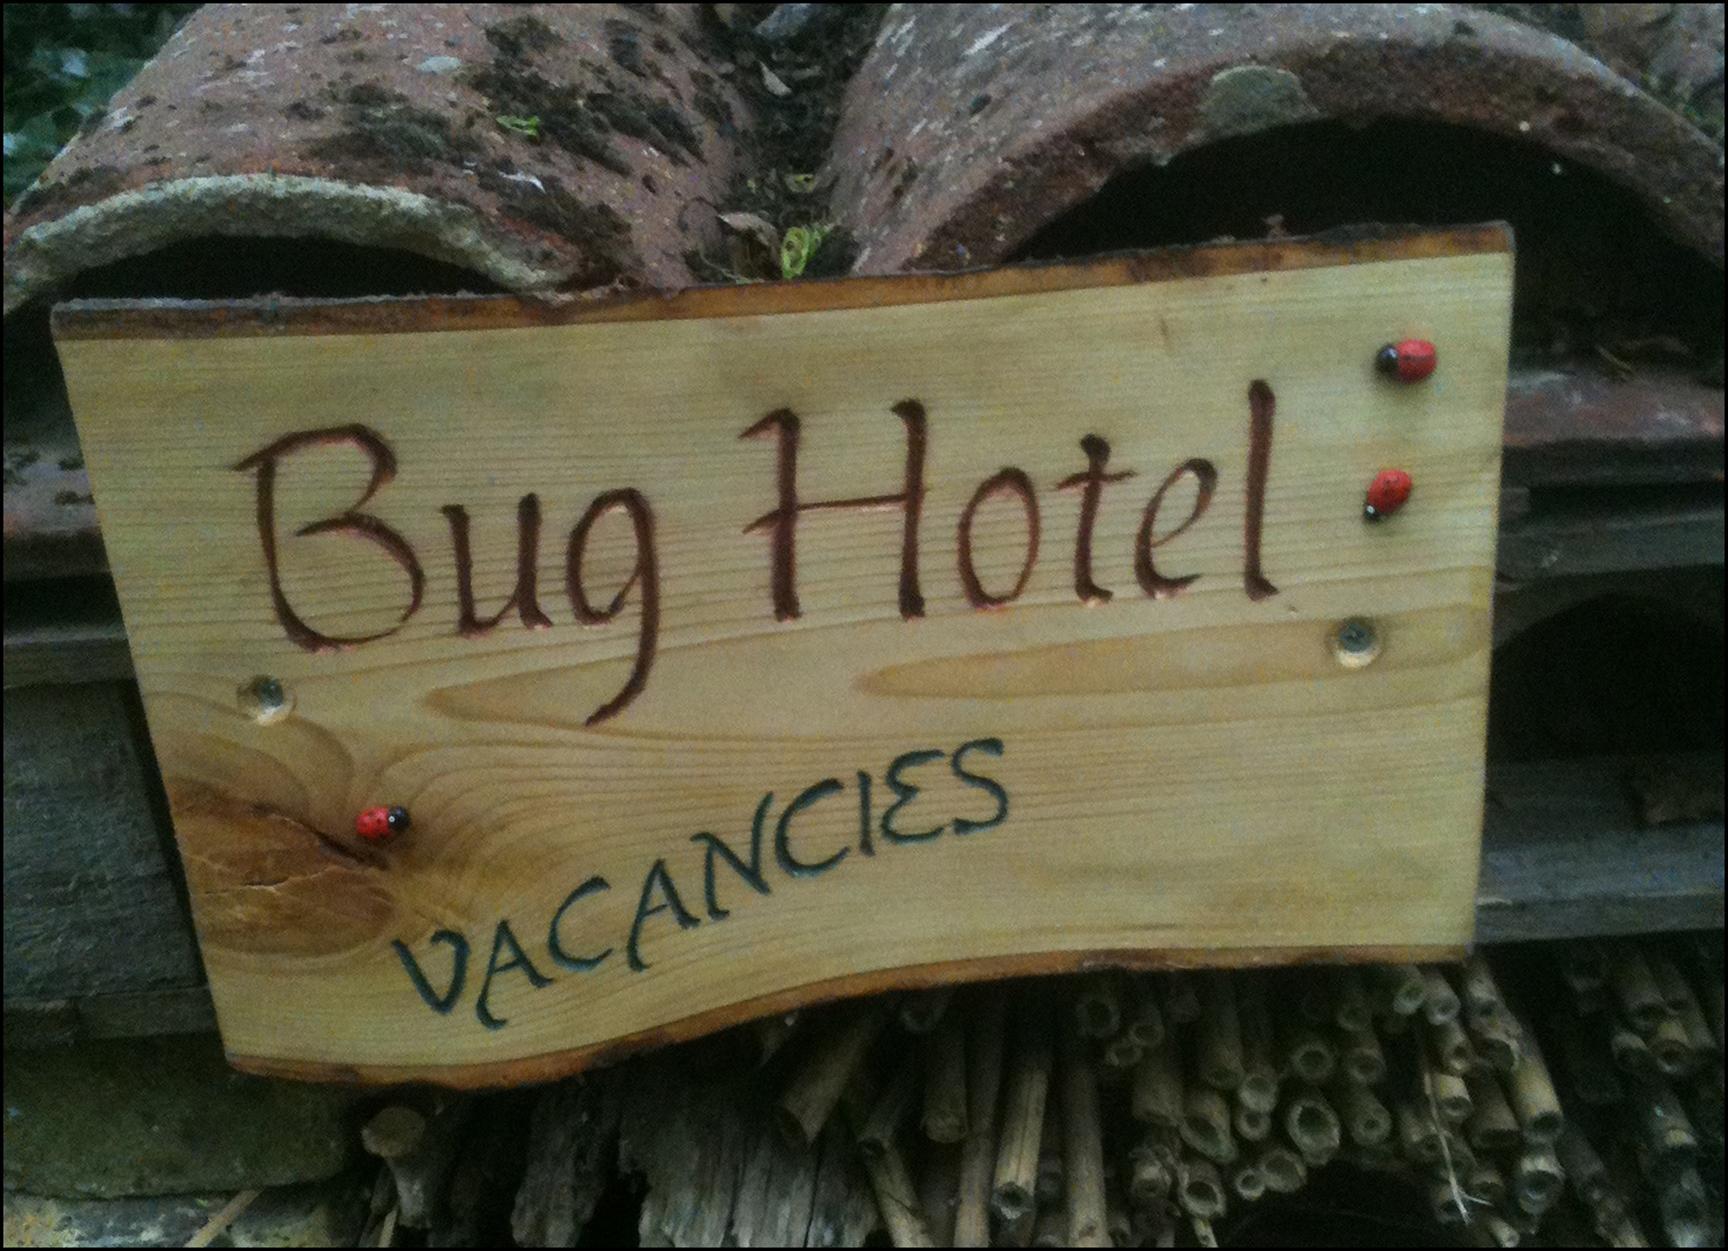 145 20130716 Bug Hotel.JPG